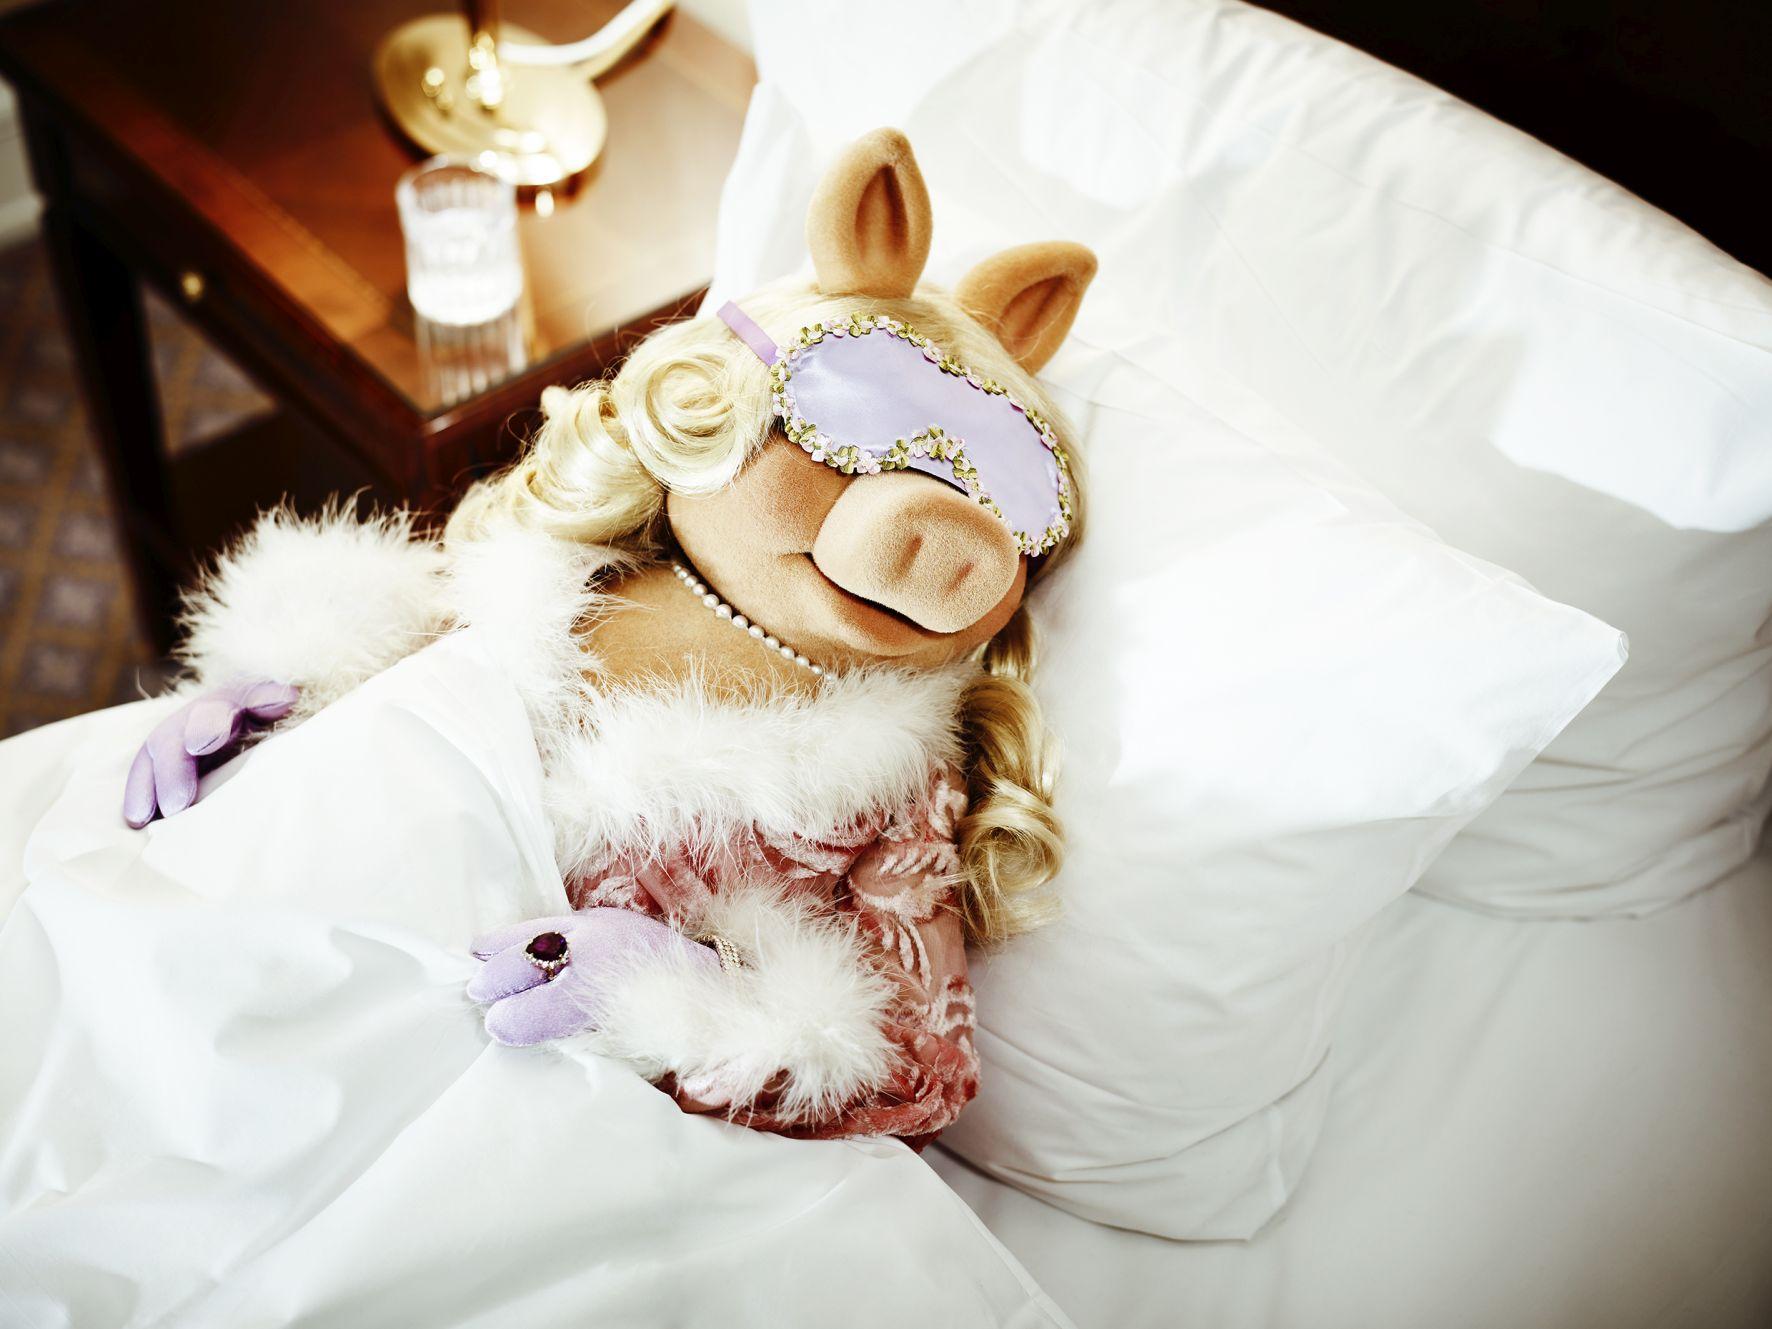 Miss Piggy at the Ritz, 2012 © Anatol Kotte